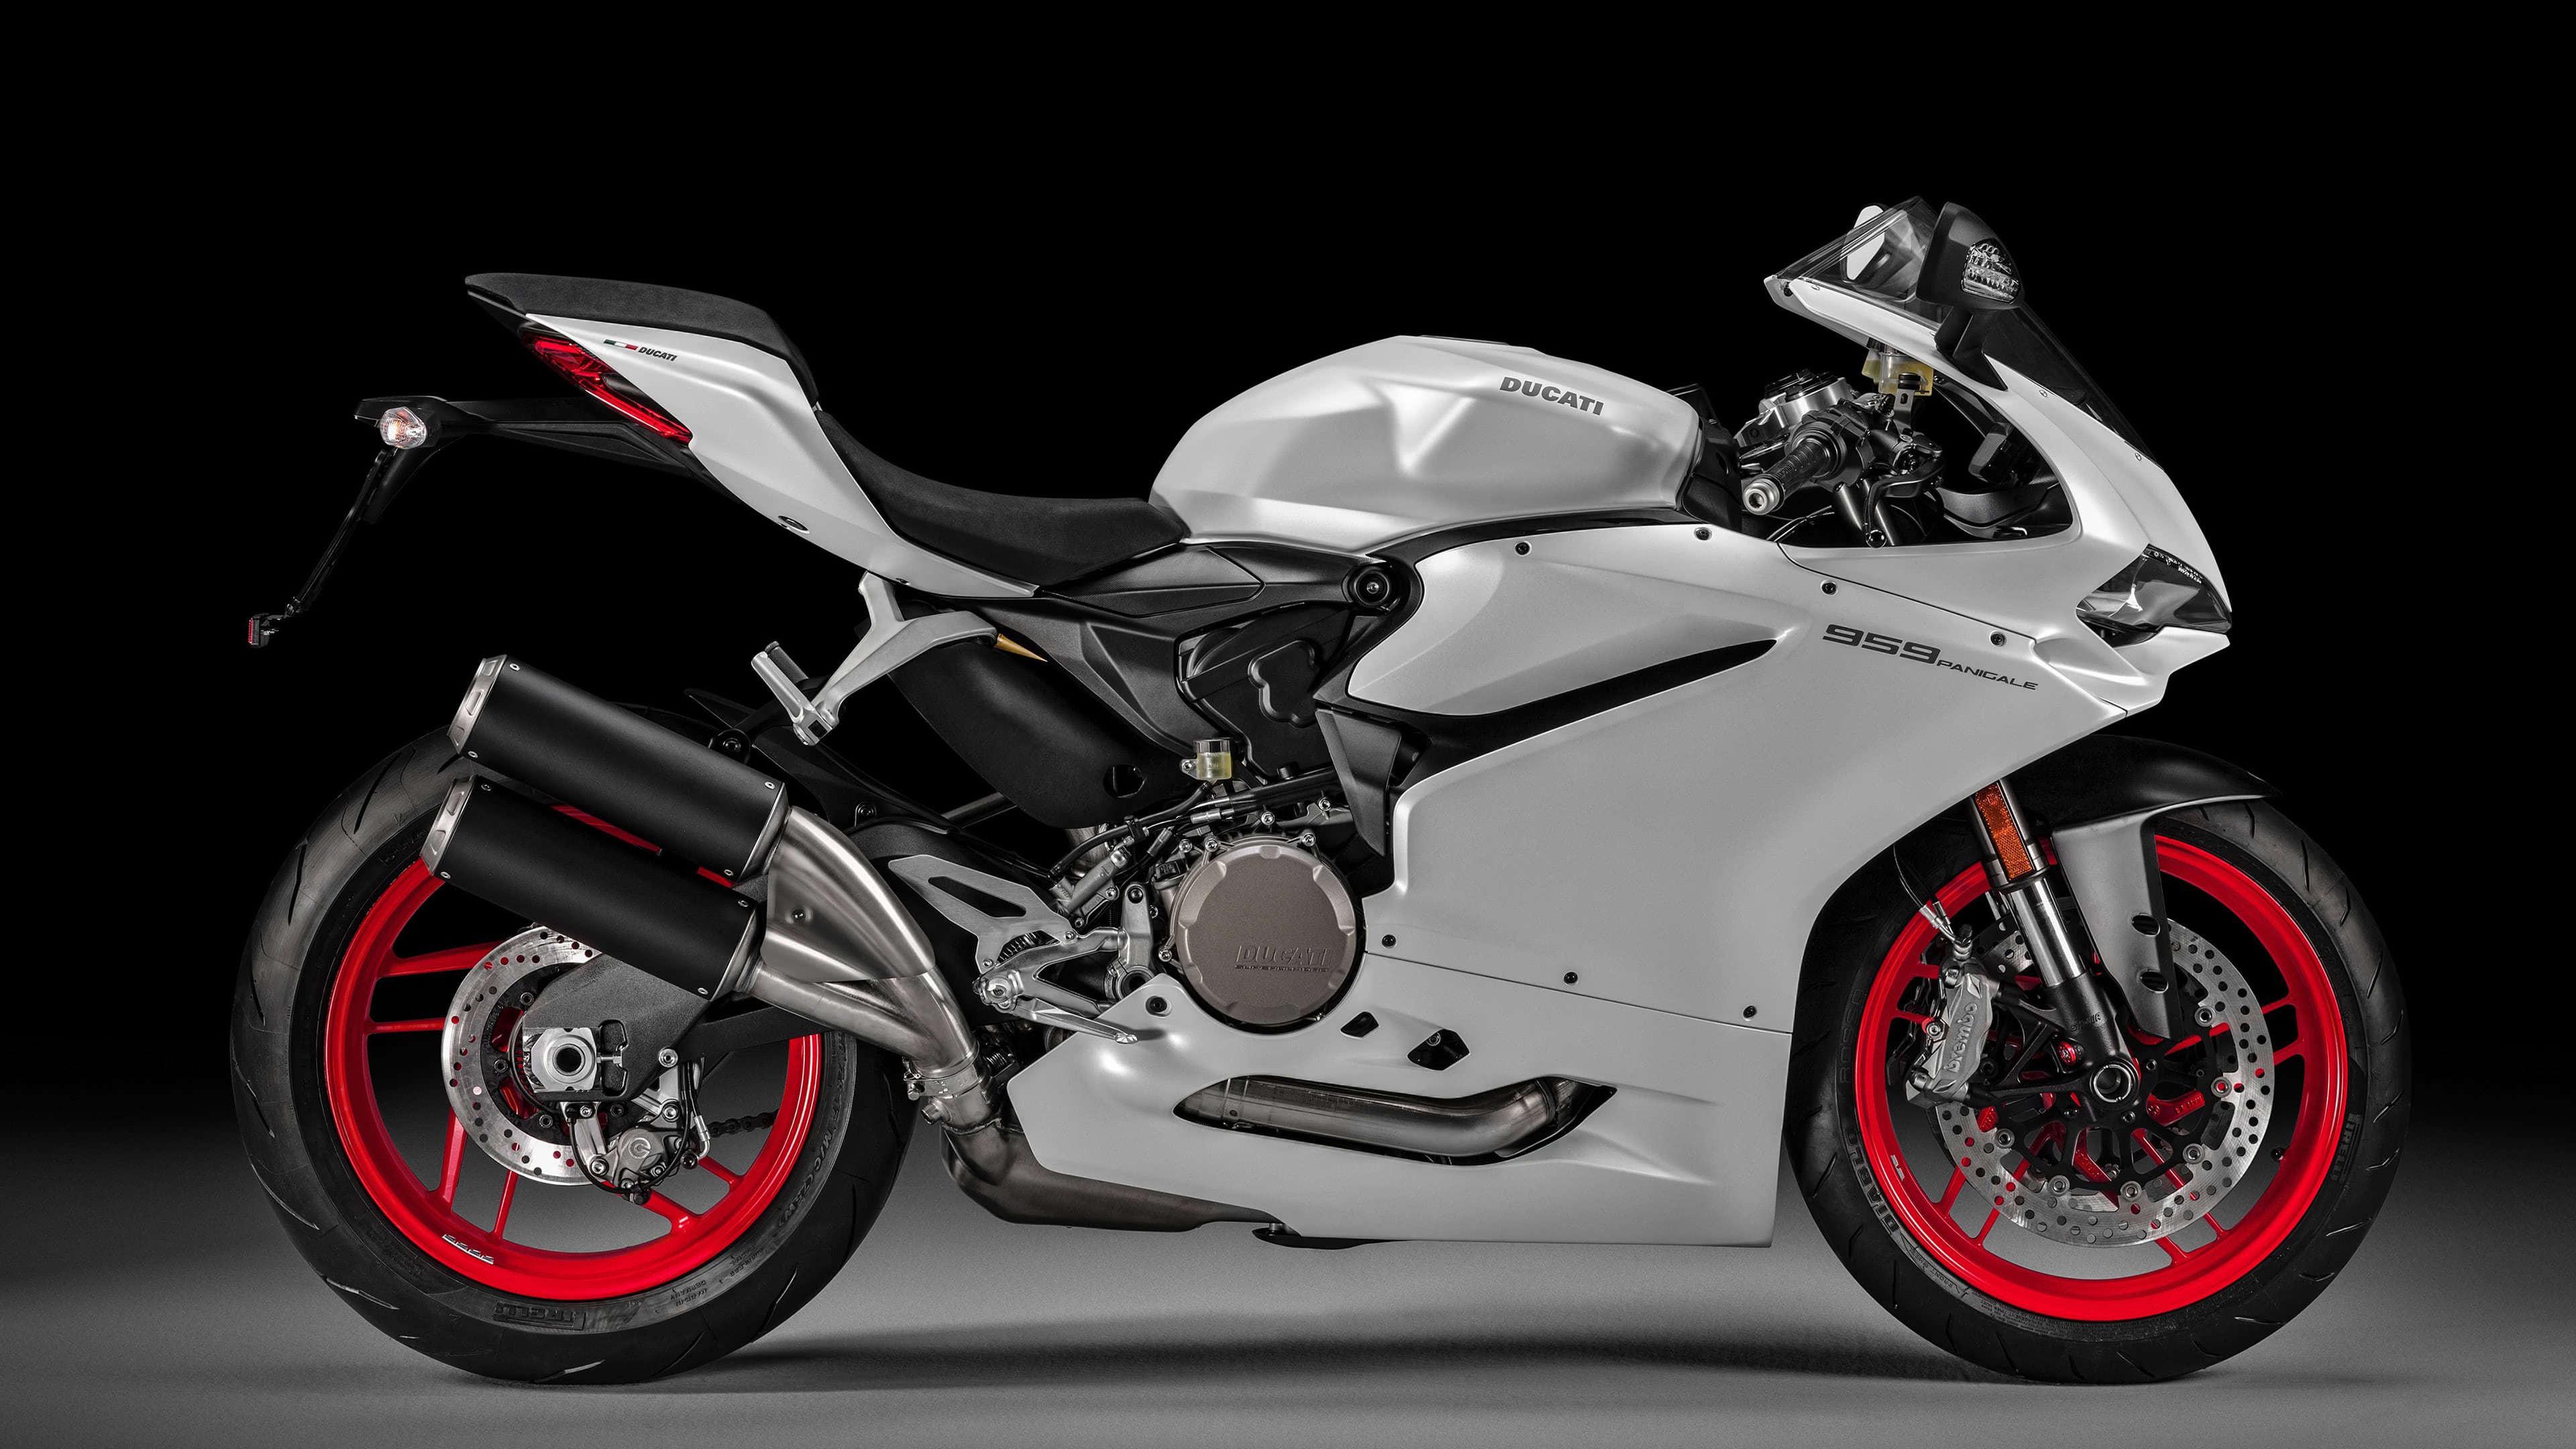 Ducati 959 Panigale UHD 4K Wallpaper